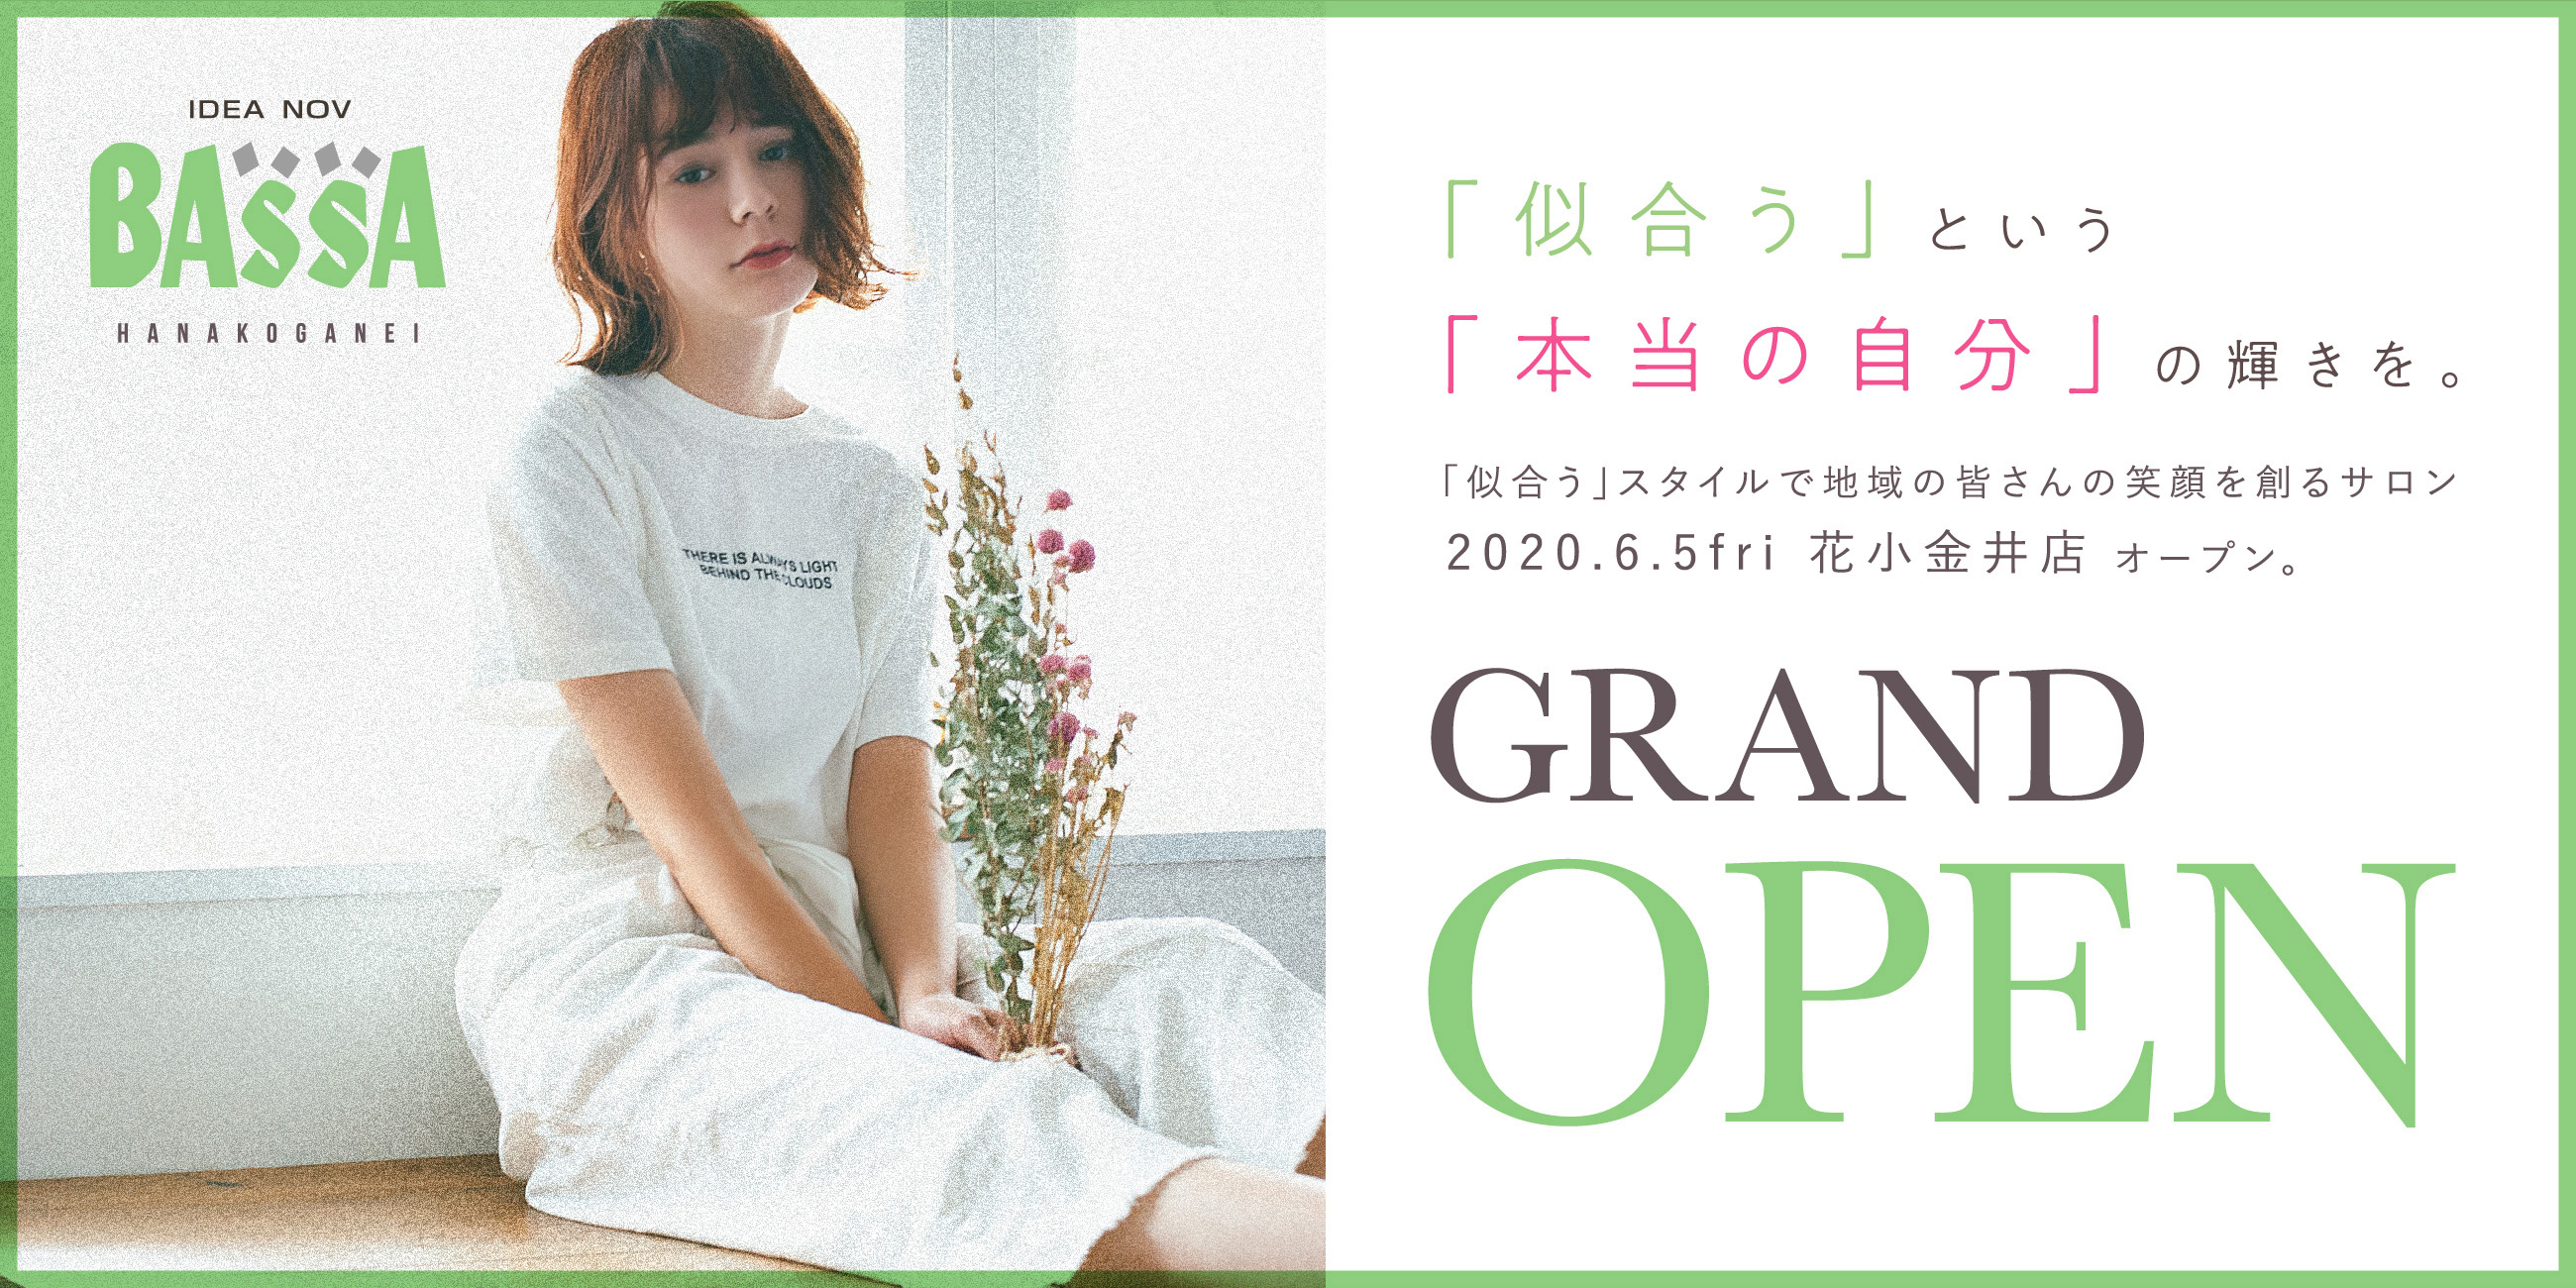 BASSA 花小金井店 GRAND OPEN